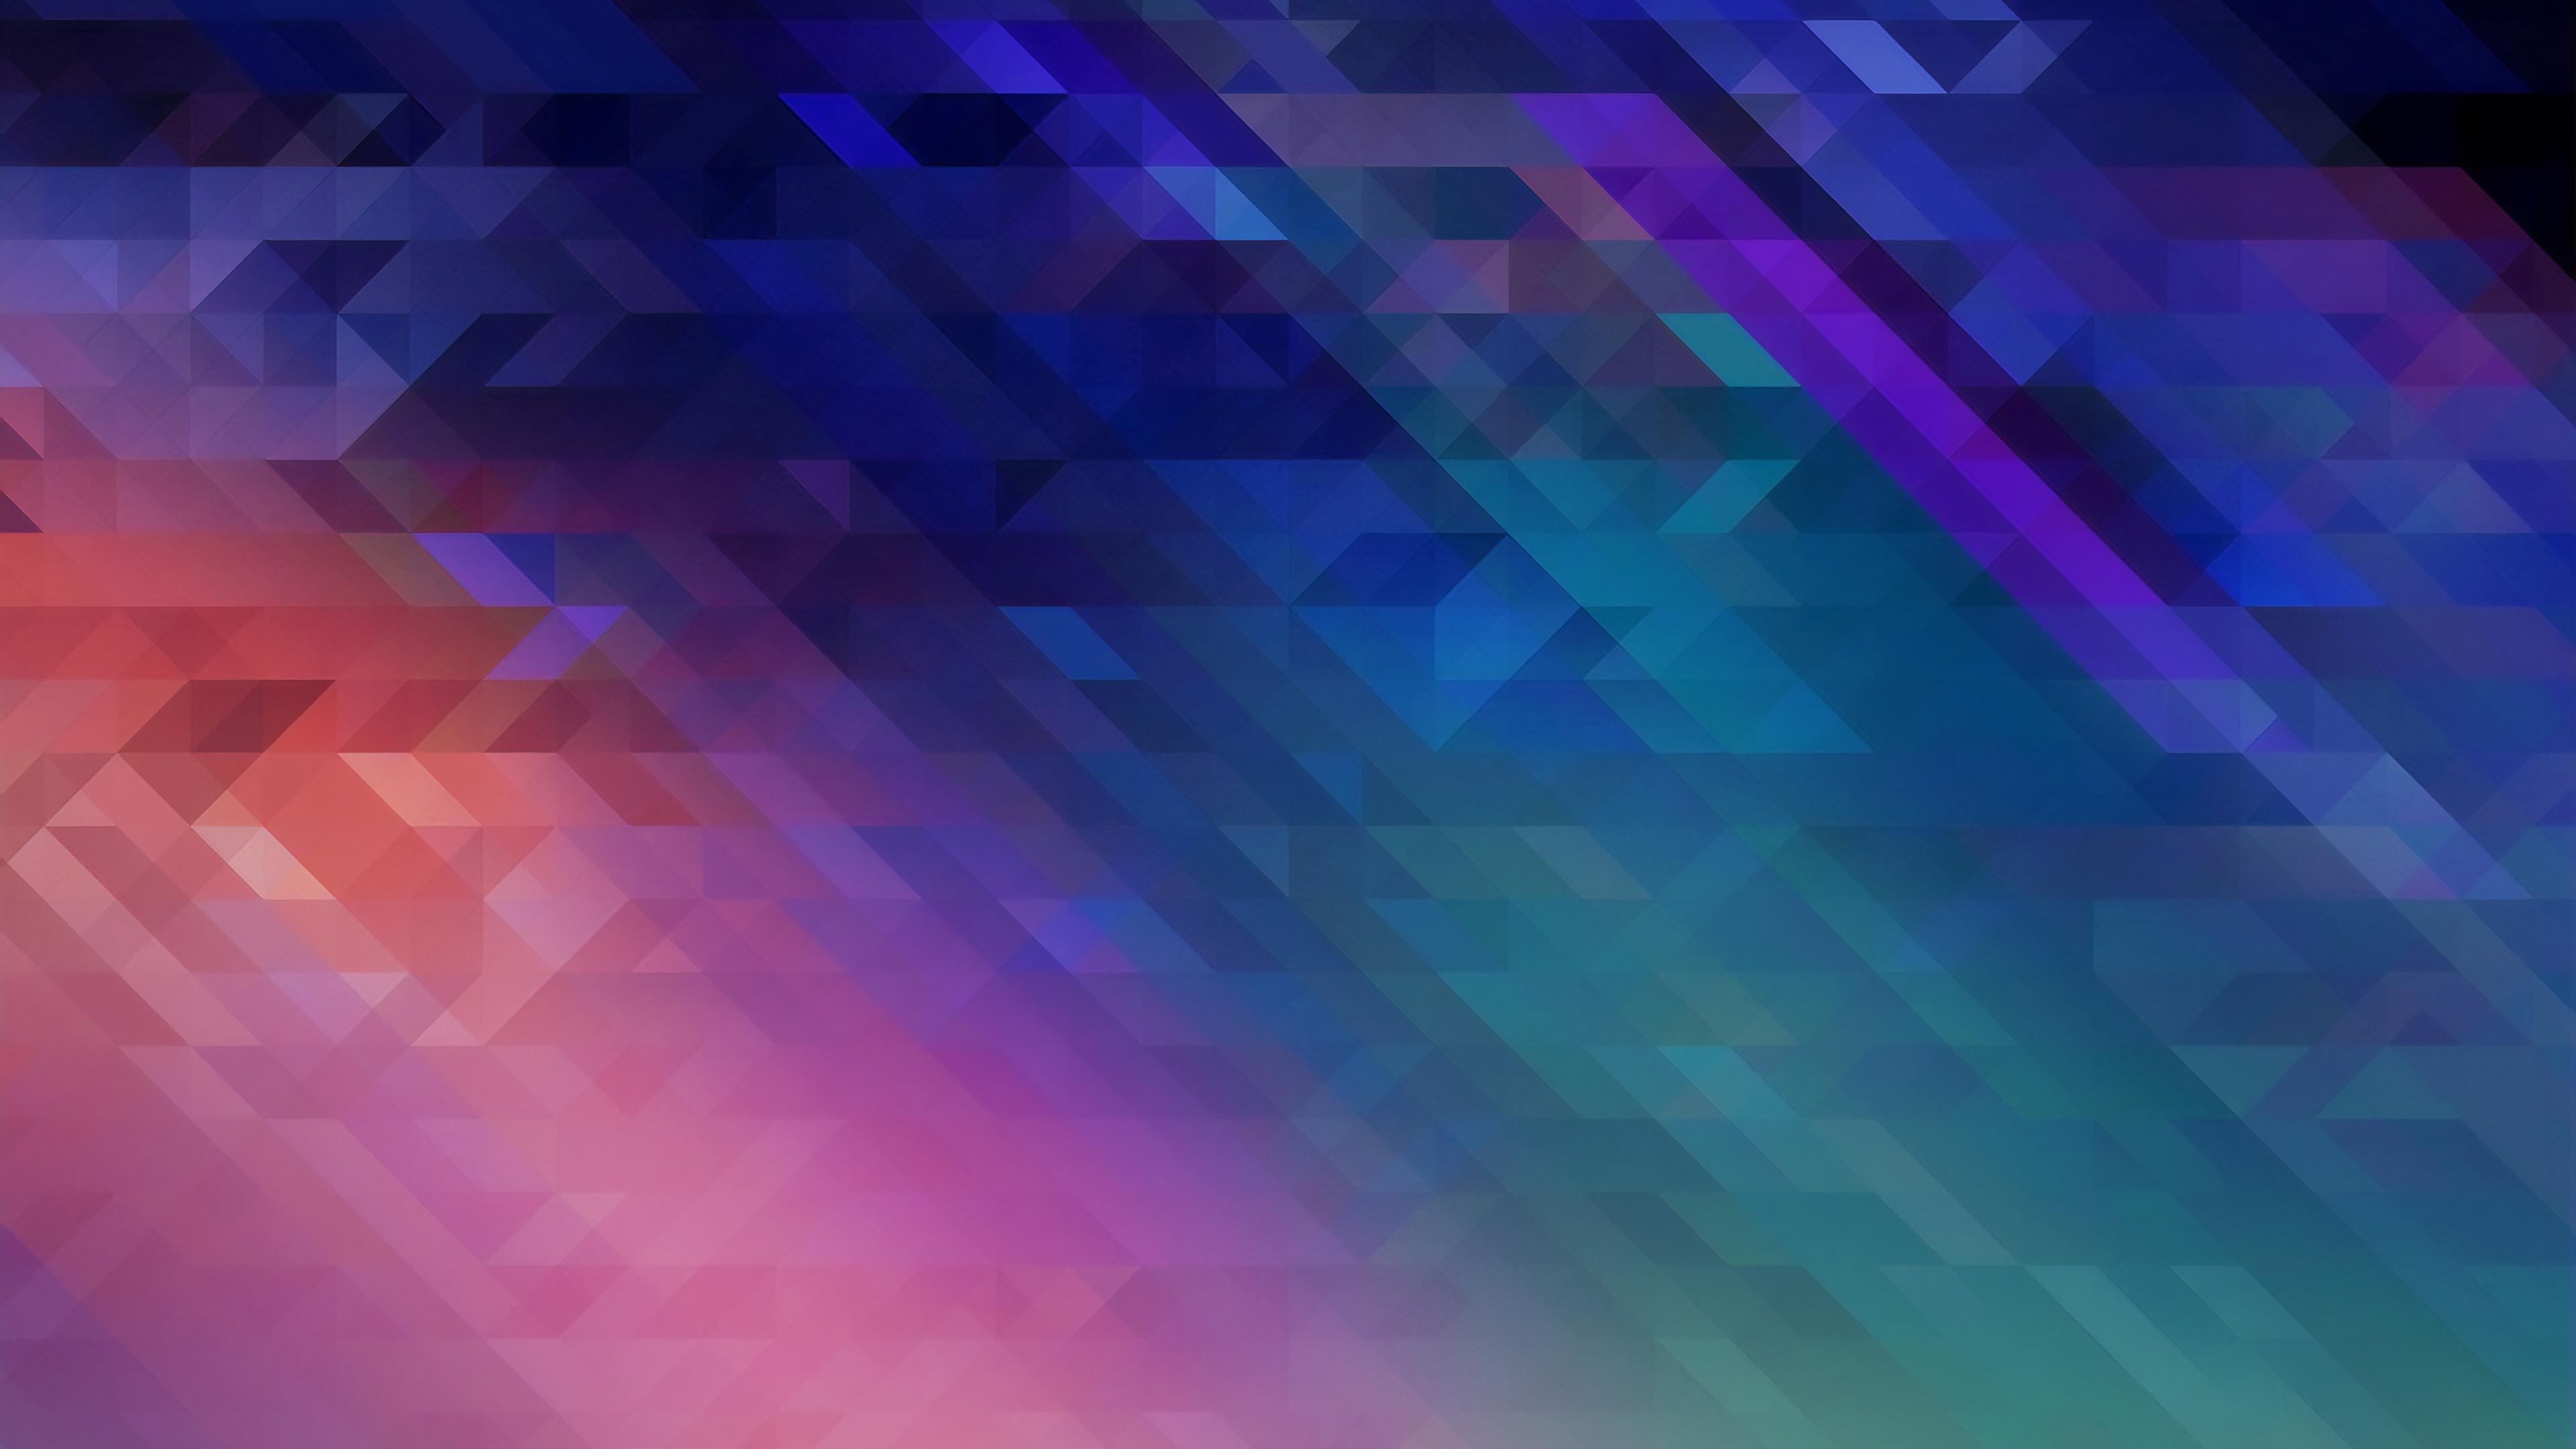 gradient color abstract 1563221435 - Gradient Color Abstract - hd-wallpapers, gradient wallpapers, digital art wallpapers, abstract wallpapers, 4k-wallpapers